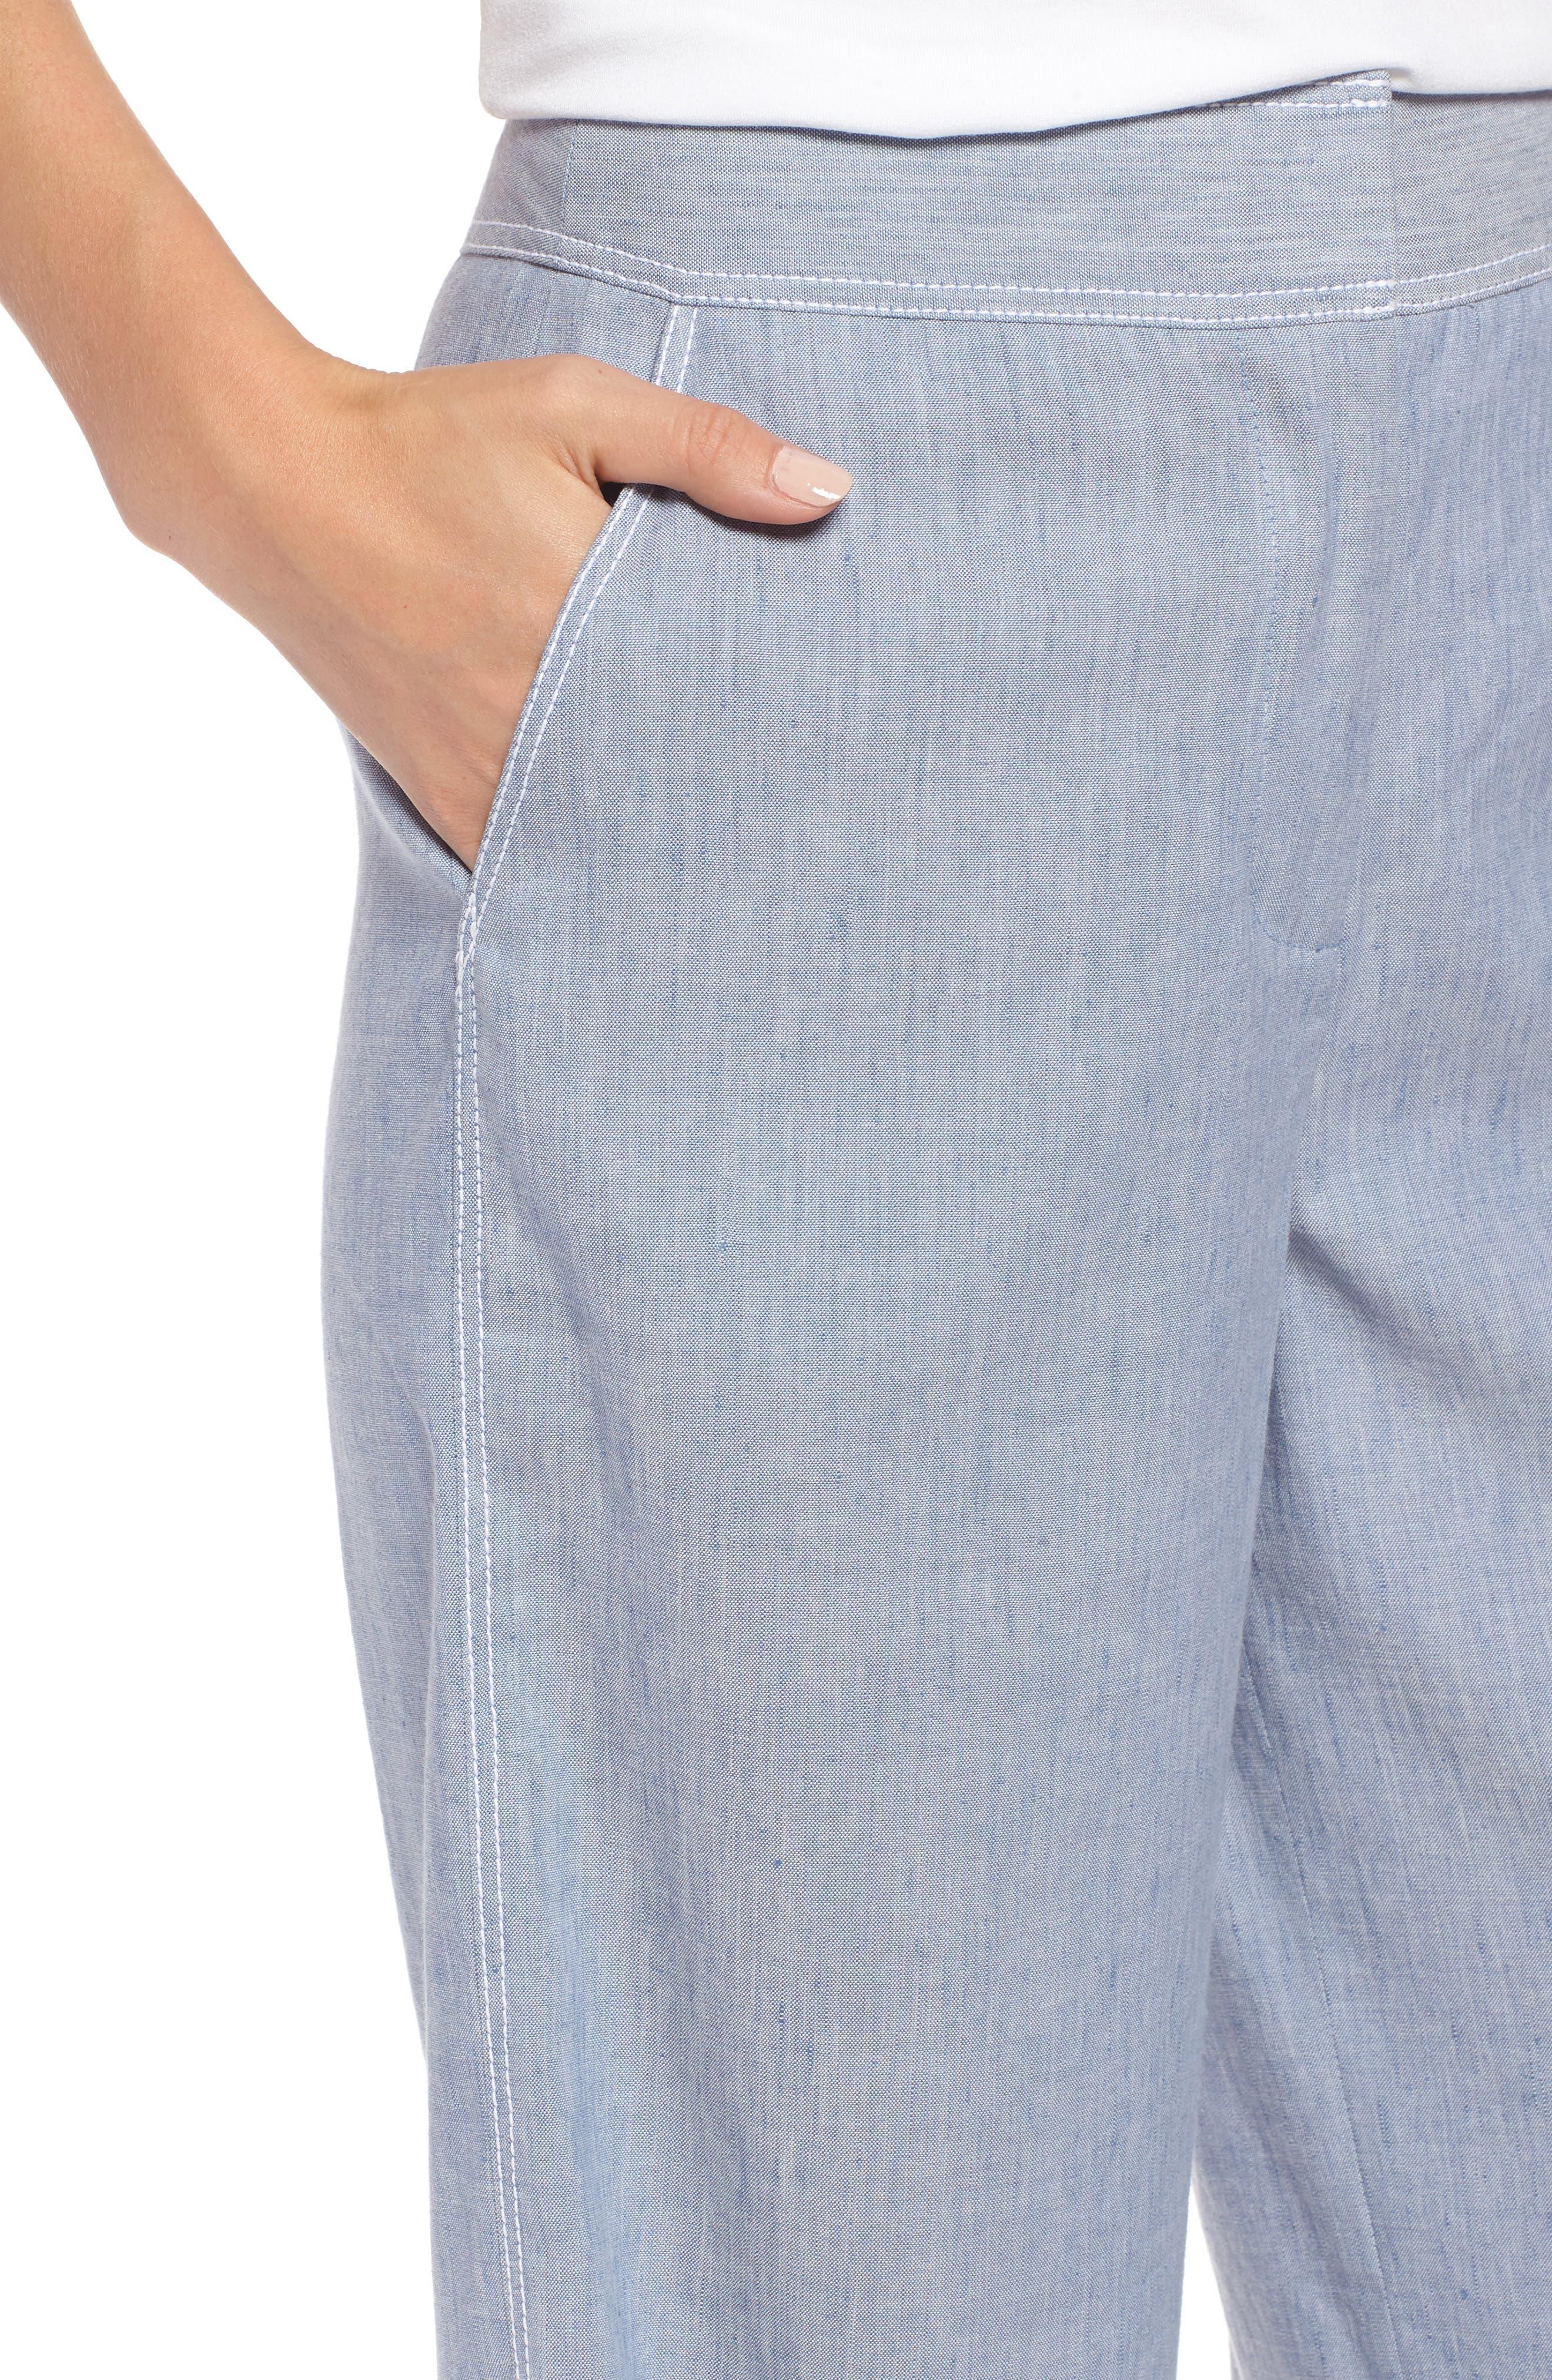 Wide Leg Linen Blend Pants,                             Alternate thumbnail 4, color,                             Chambray